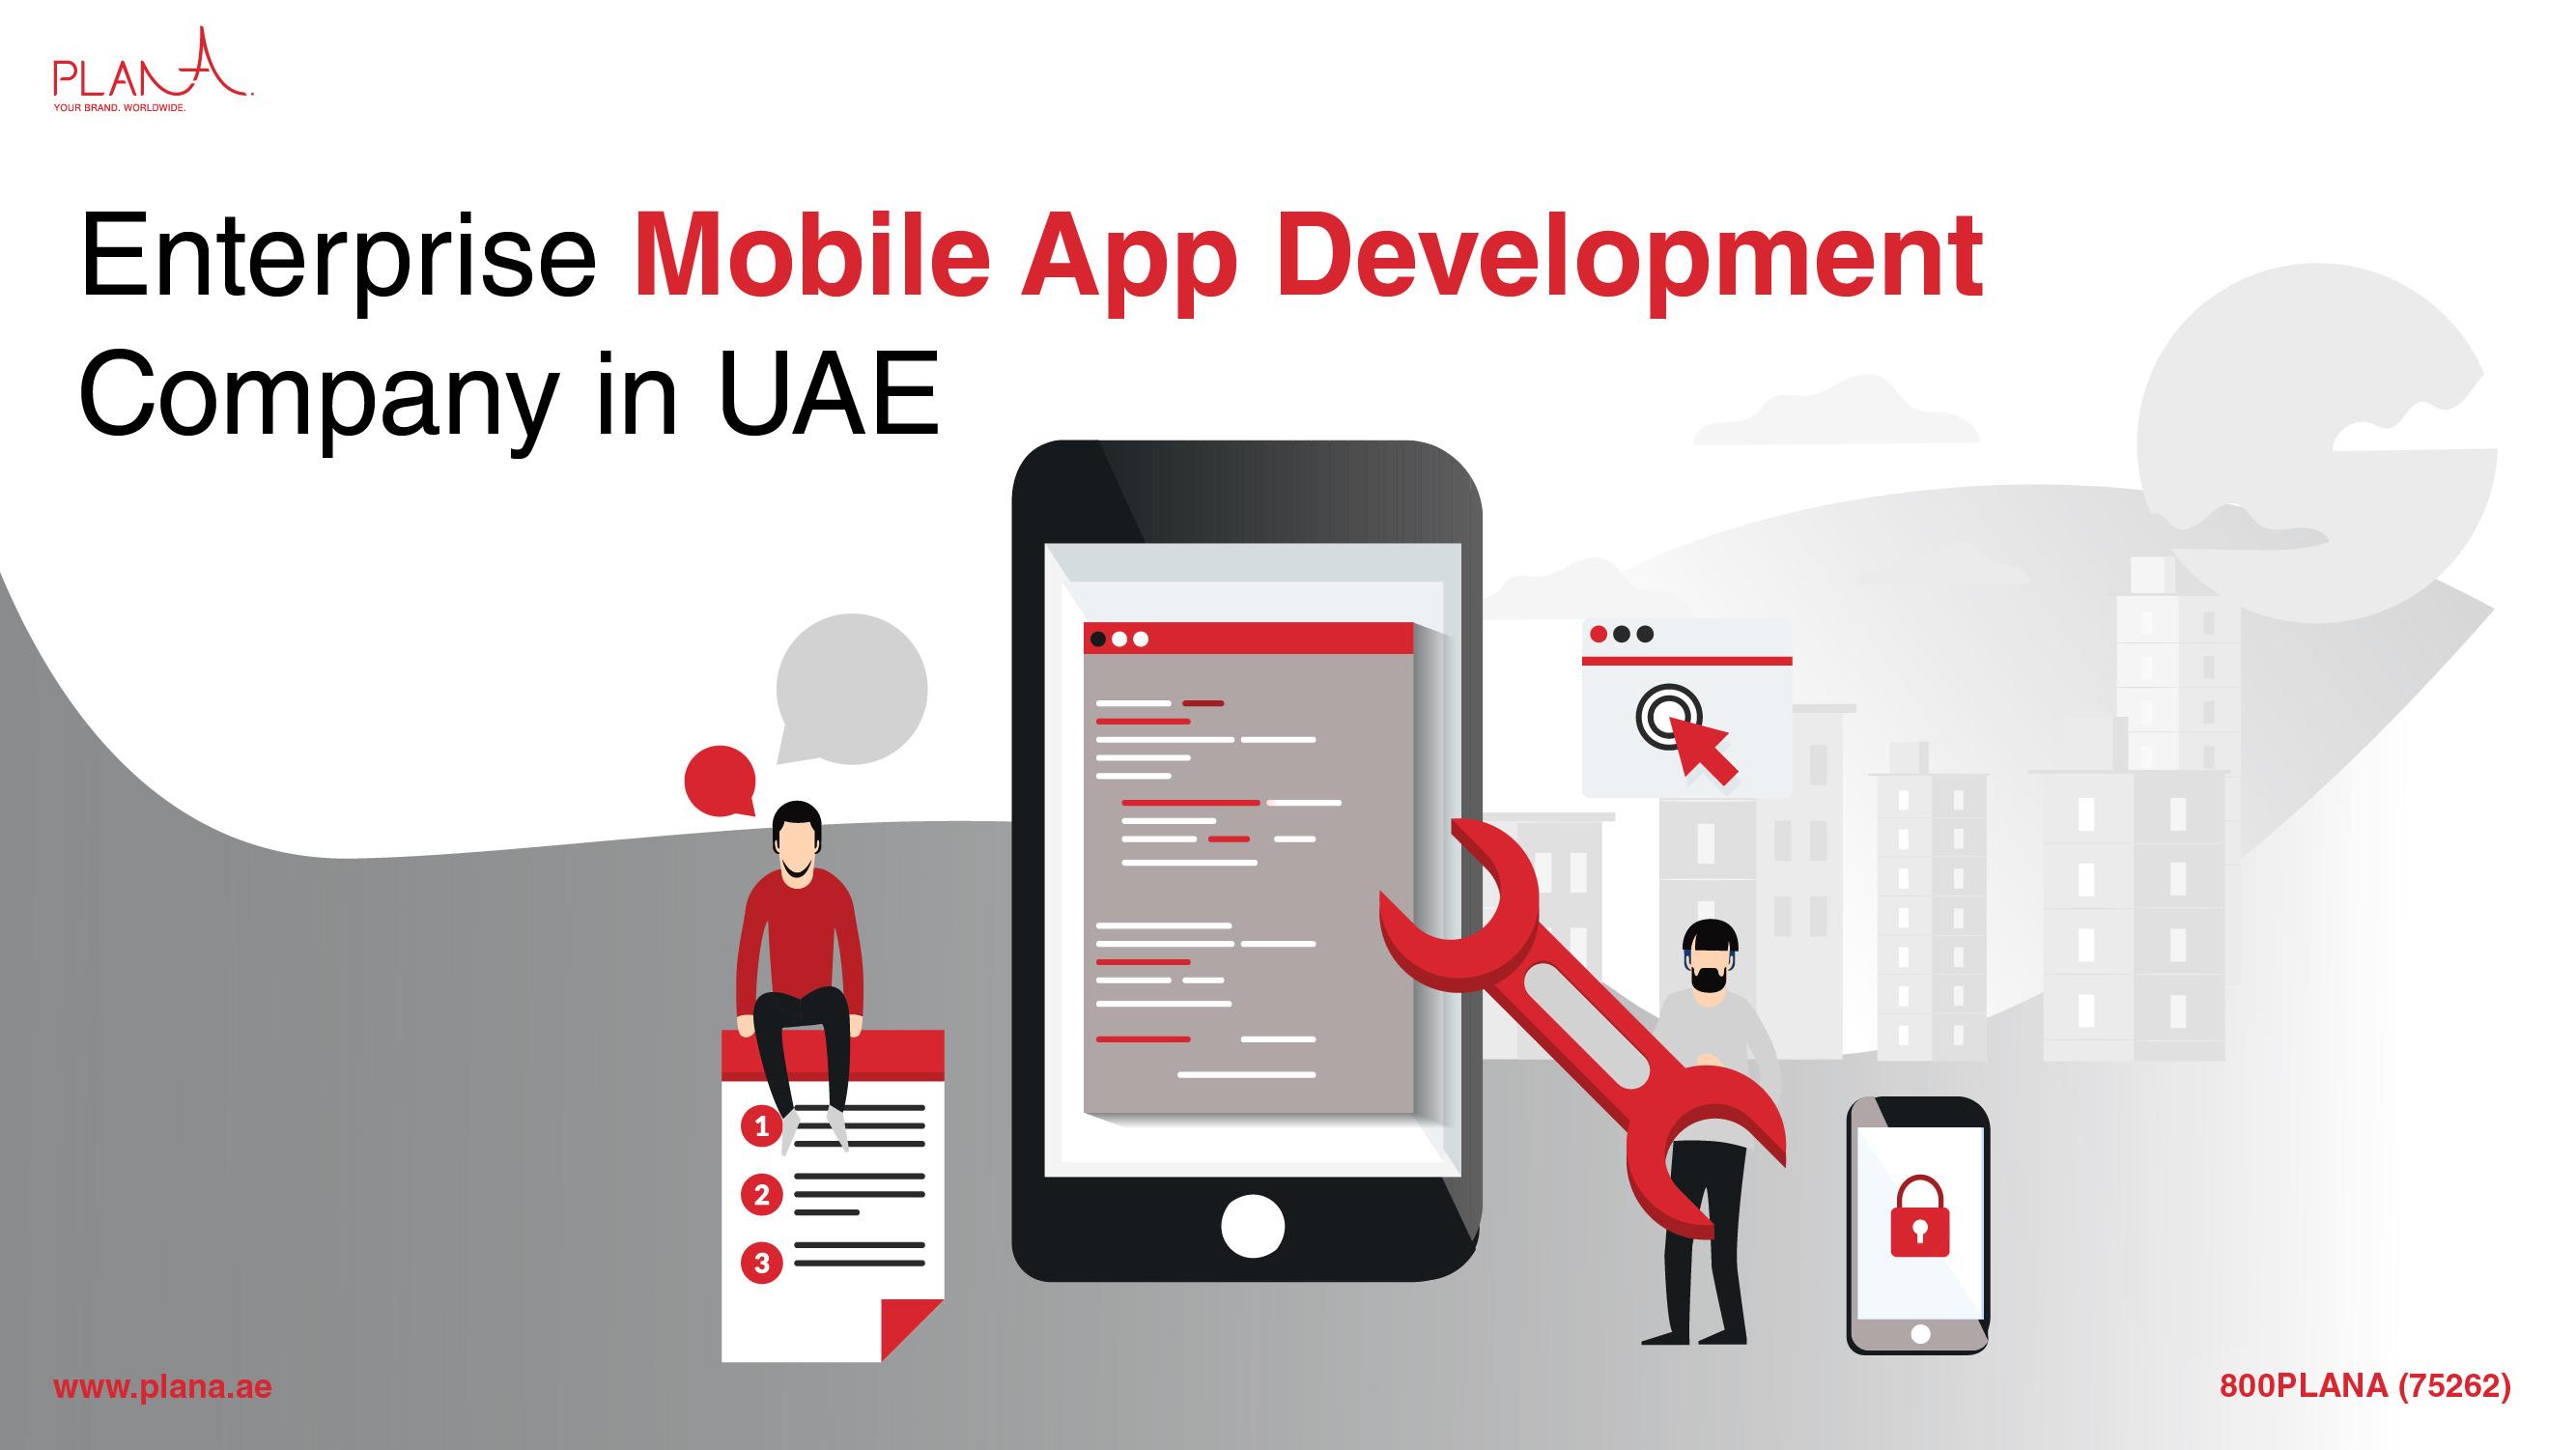 Enterprise Mobile App Development Company in UAE